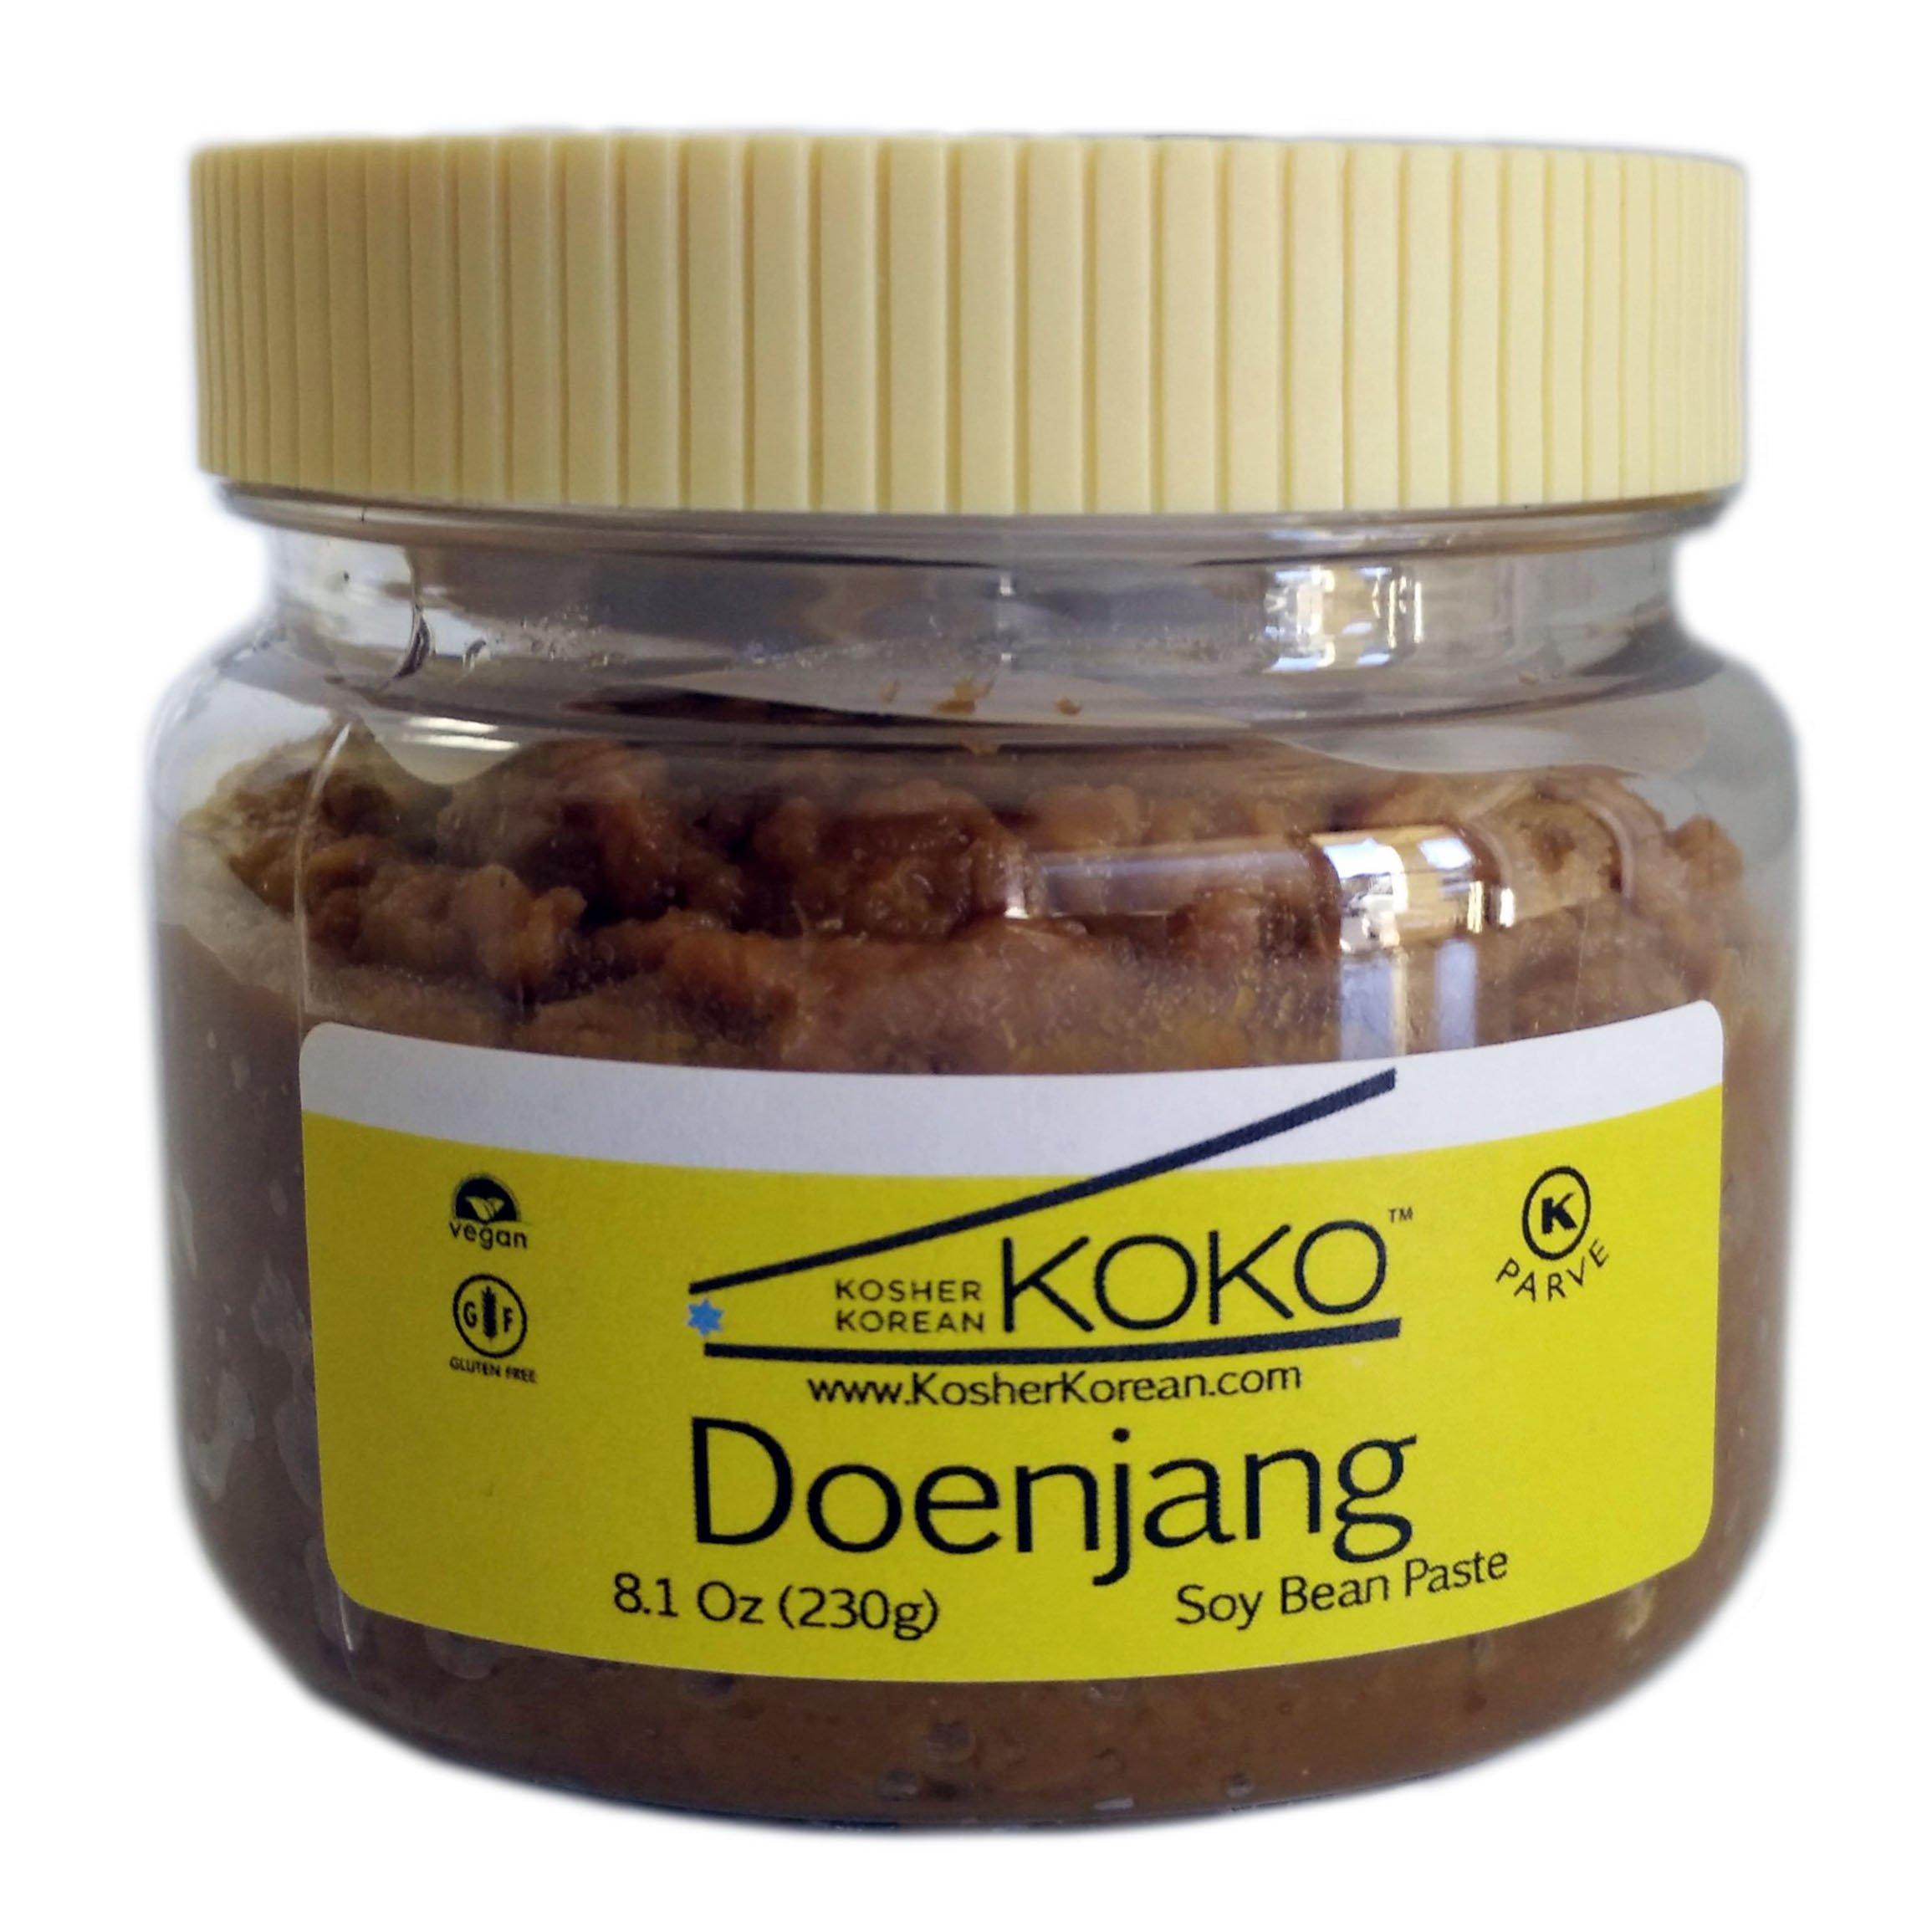 Koko Doenjang Korean Miso (Fermented Soybean Paste) 8.1oz(230g) - Certified Kosher Doenjang - Premium Gluten Free 100% Korean - All Natural